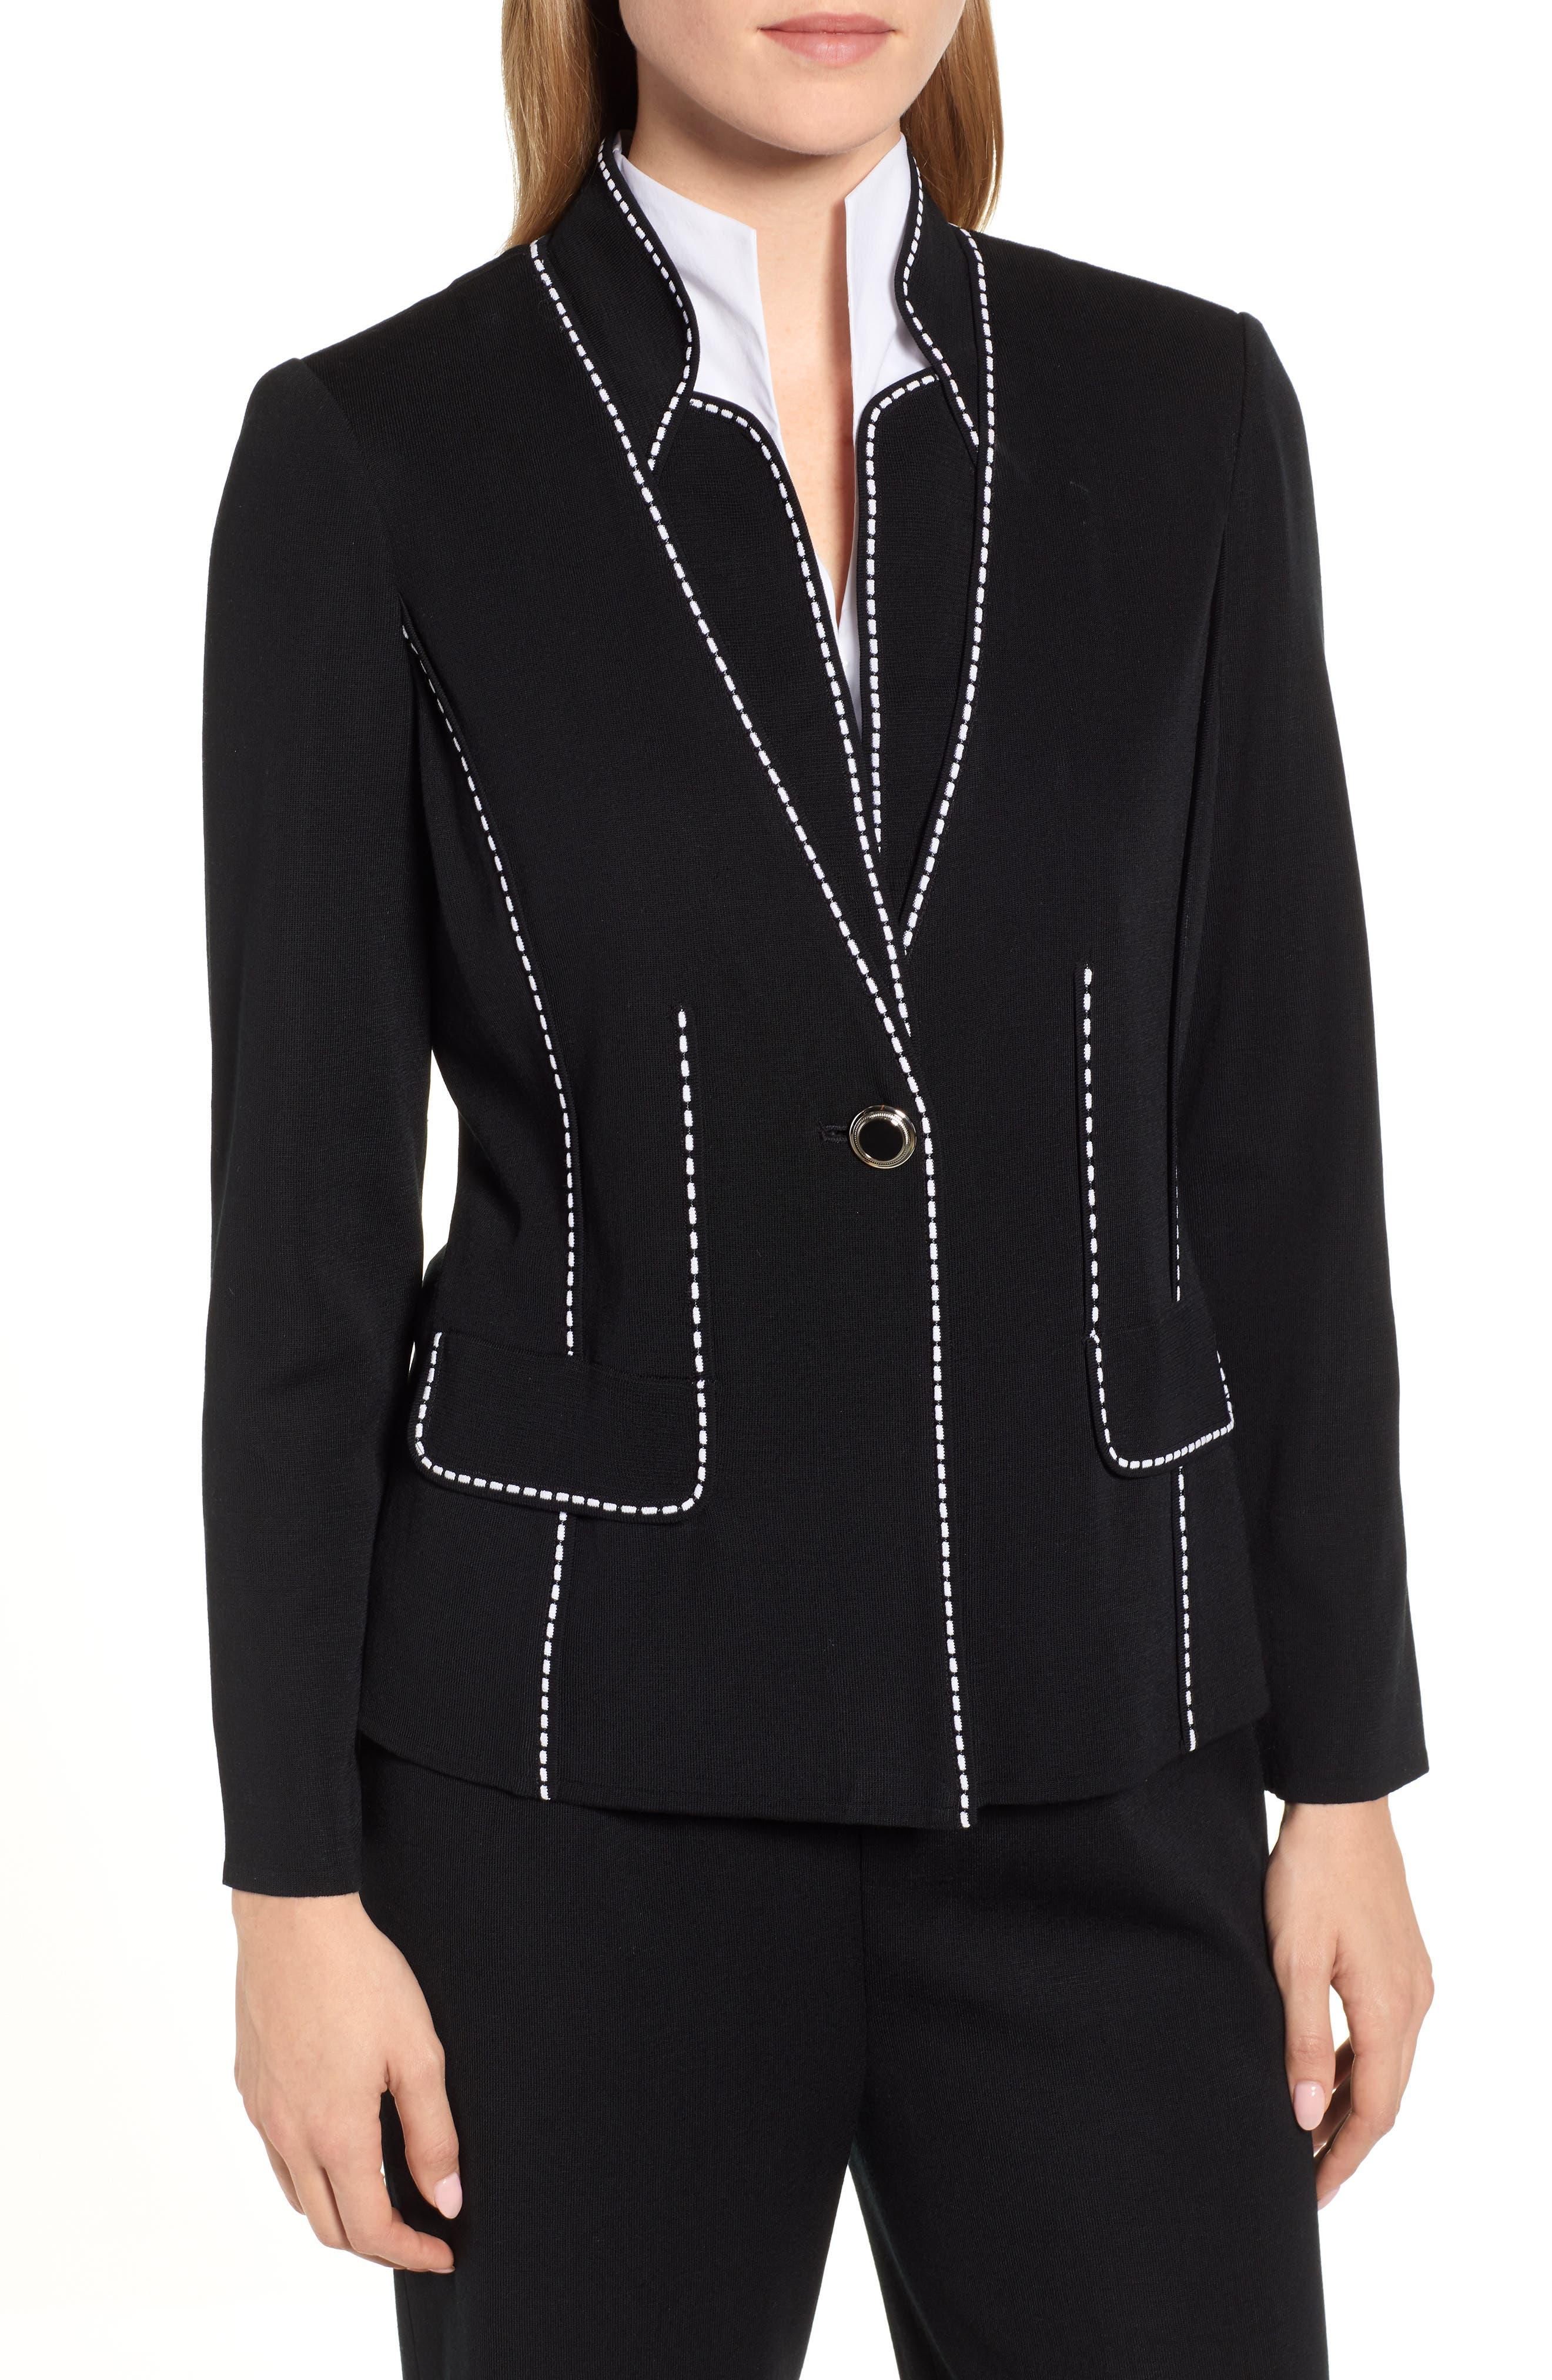 Contrast Jacquard Sweater Jacket,                             Main thumbnail 1, color,                             BLACK/ WHITE